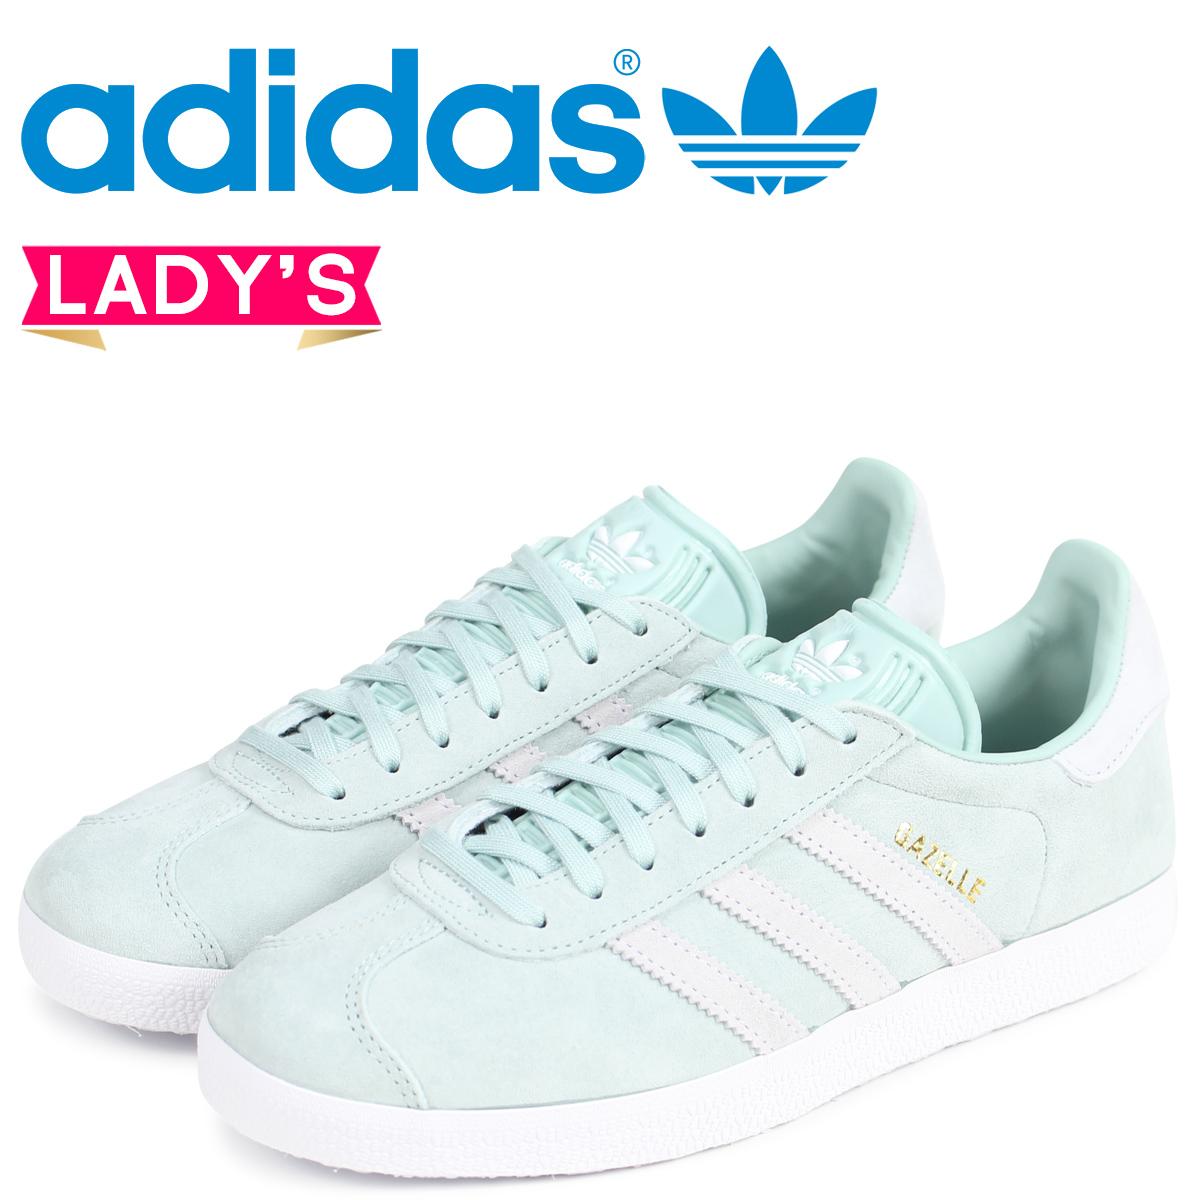 Adidas originals adidas Originals Women's GAZELLE OG DRAGON W sneakers Gazelle Dragon leather men white D65896 [5 2 new in stock] [regular] ★ ★